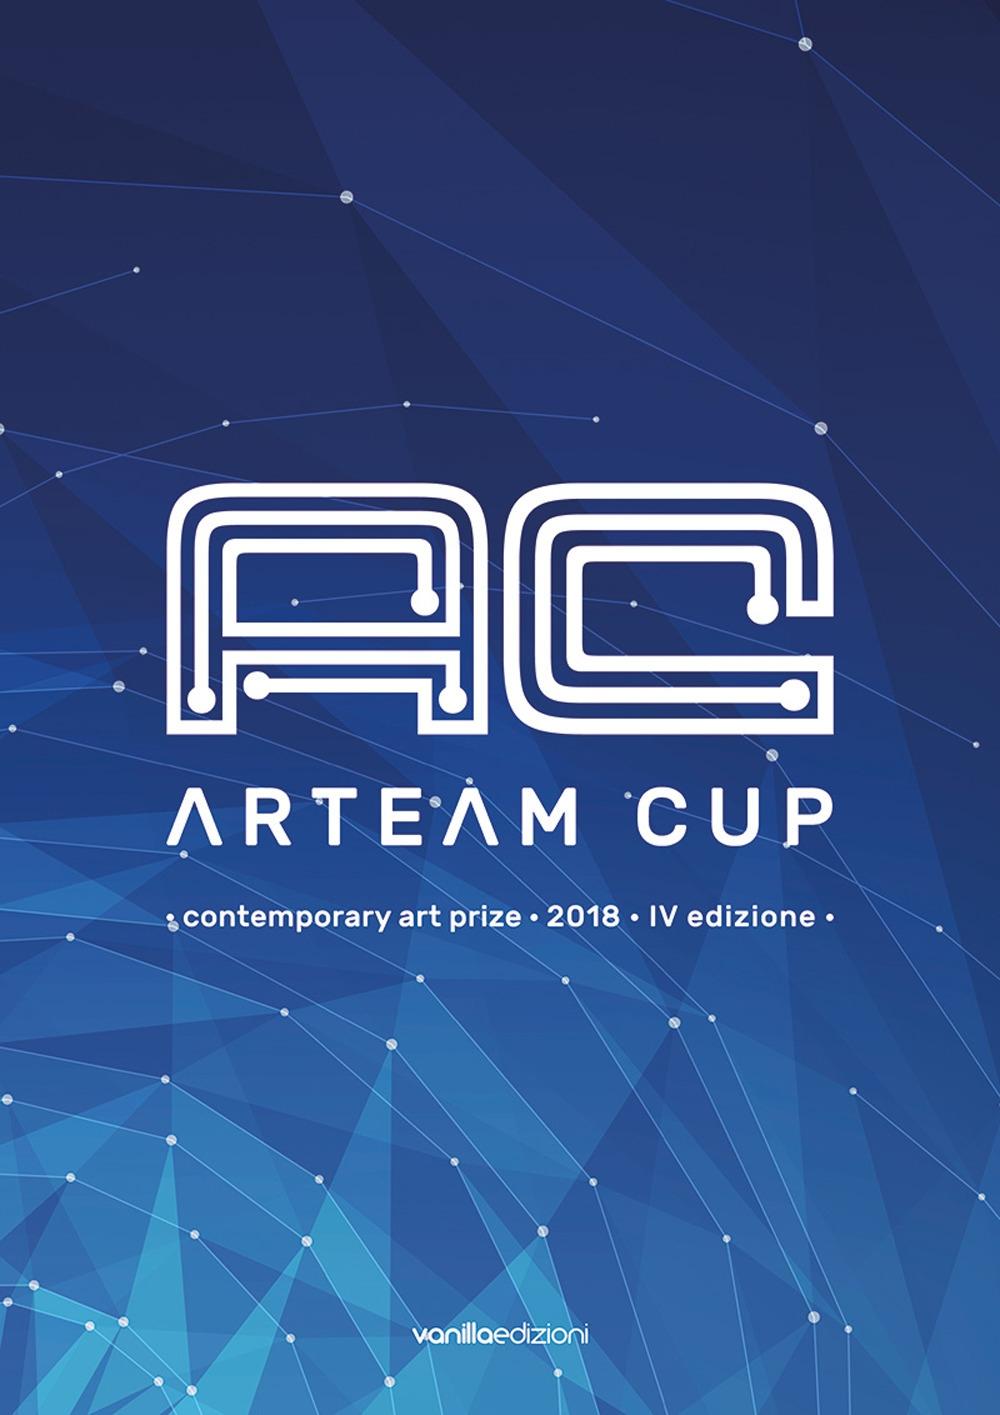 Arteam Cup. Contemporary art price 2018. 4ª edizione.